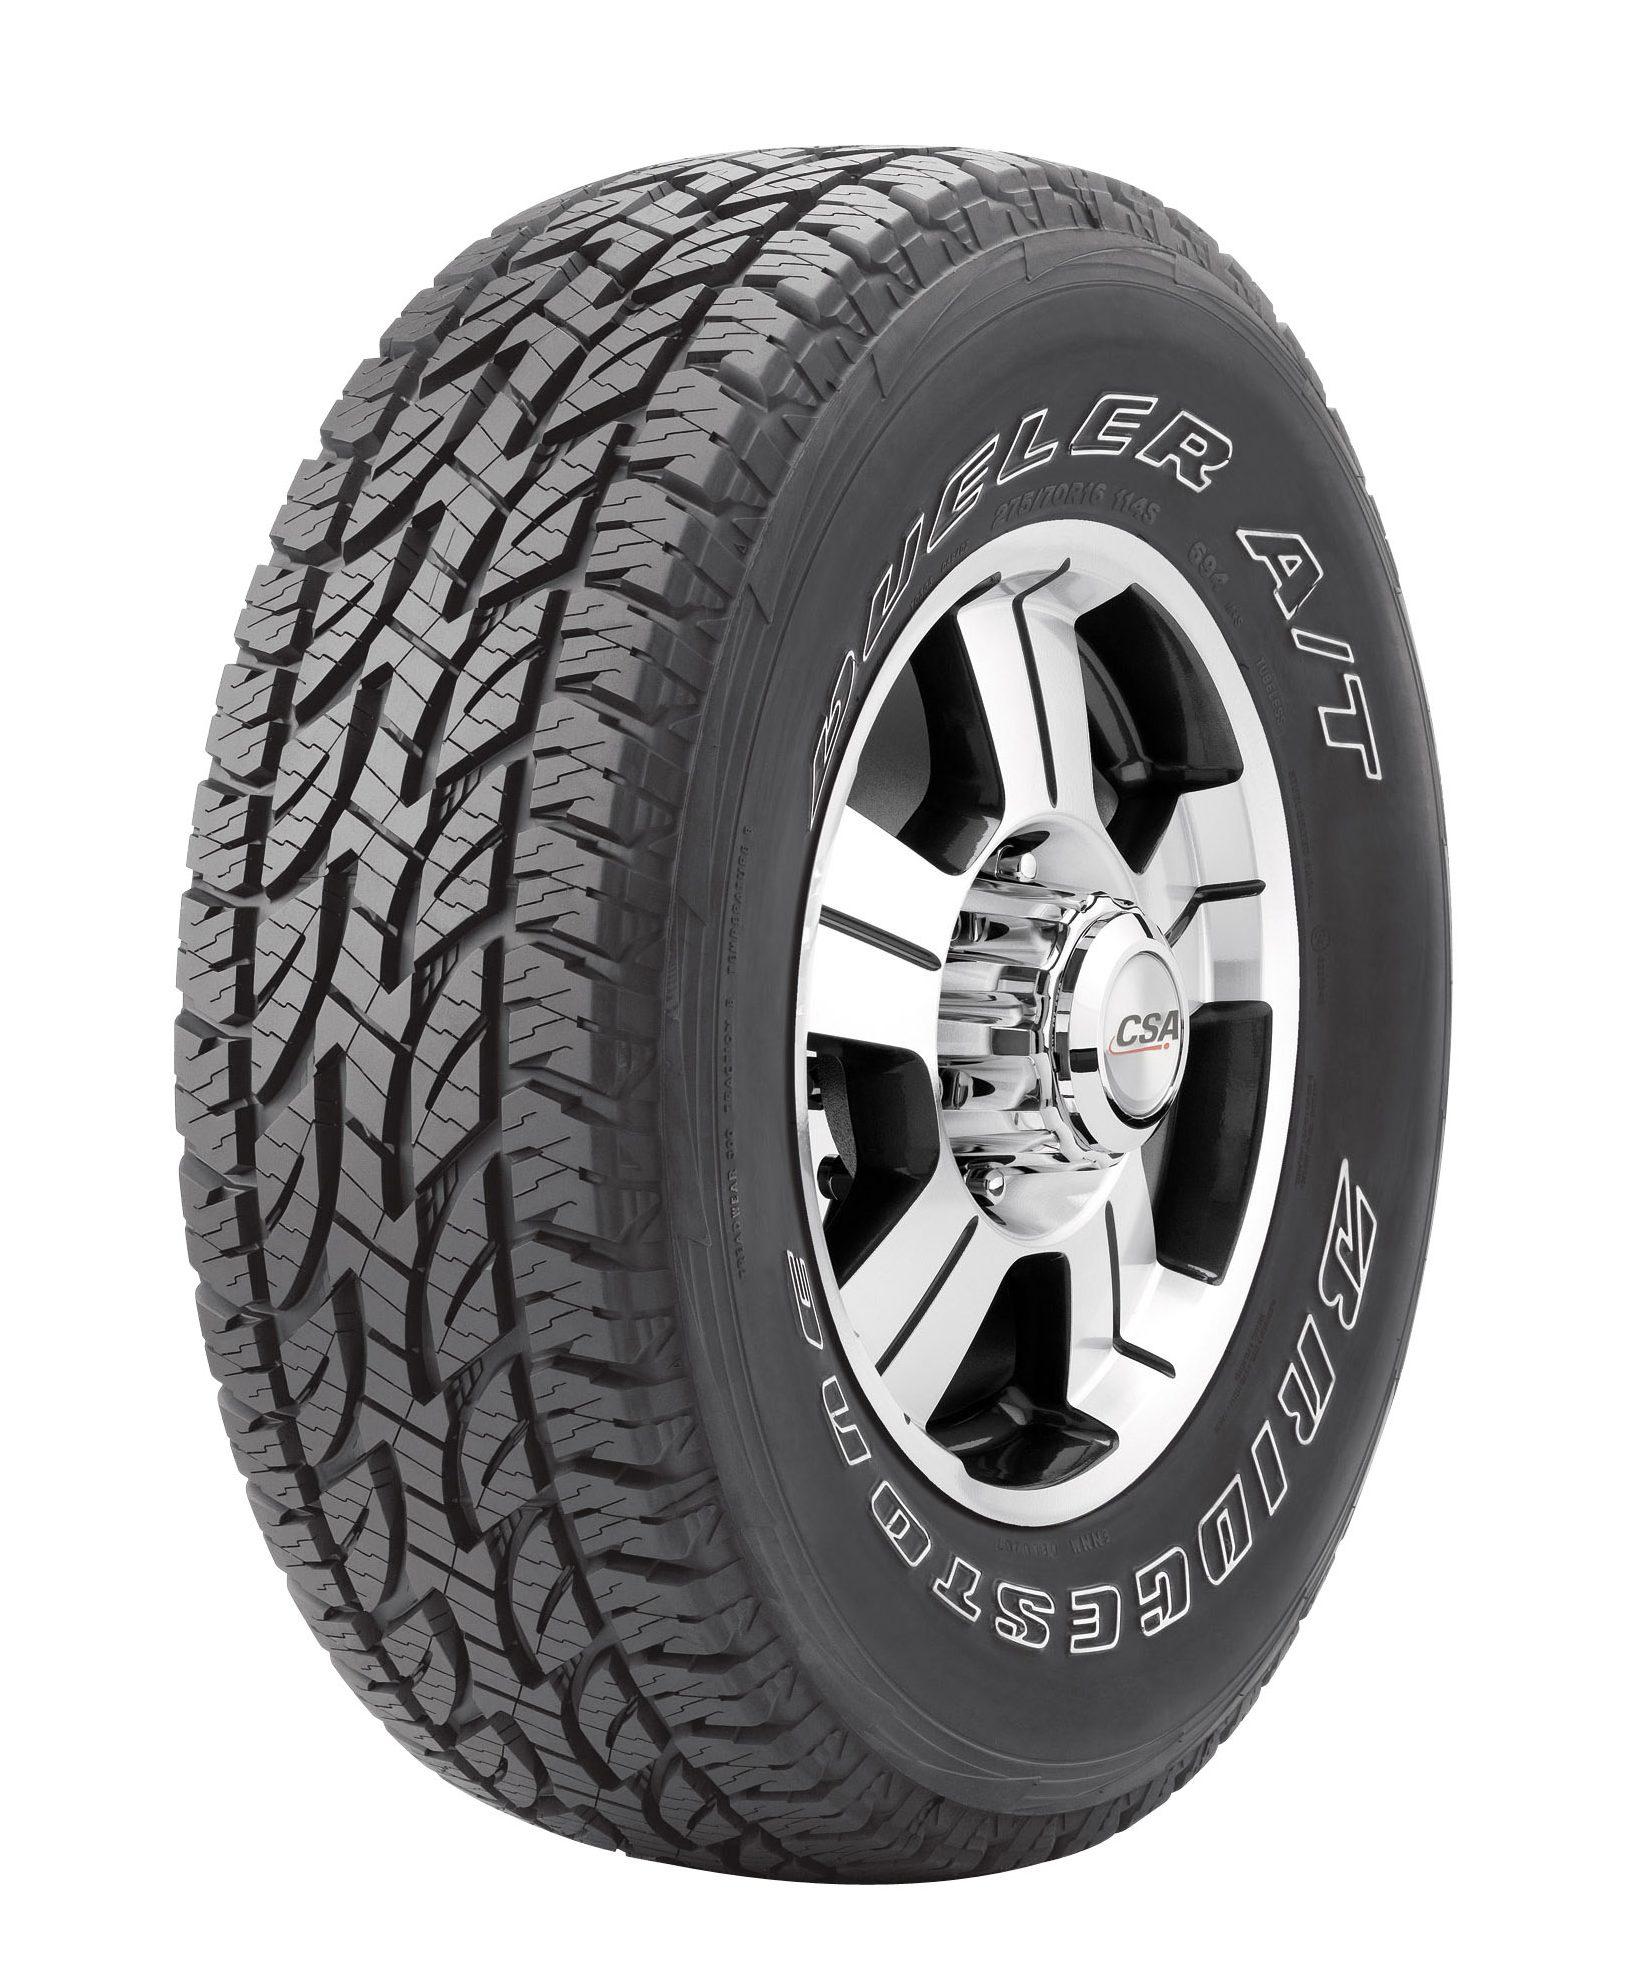 225/75 R16  D694  Bridgestone Japan